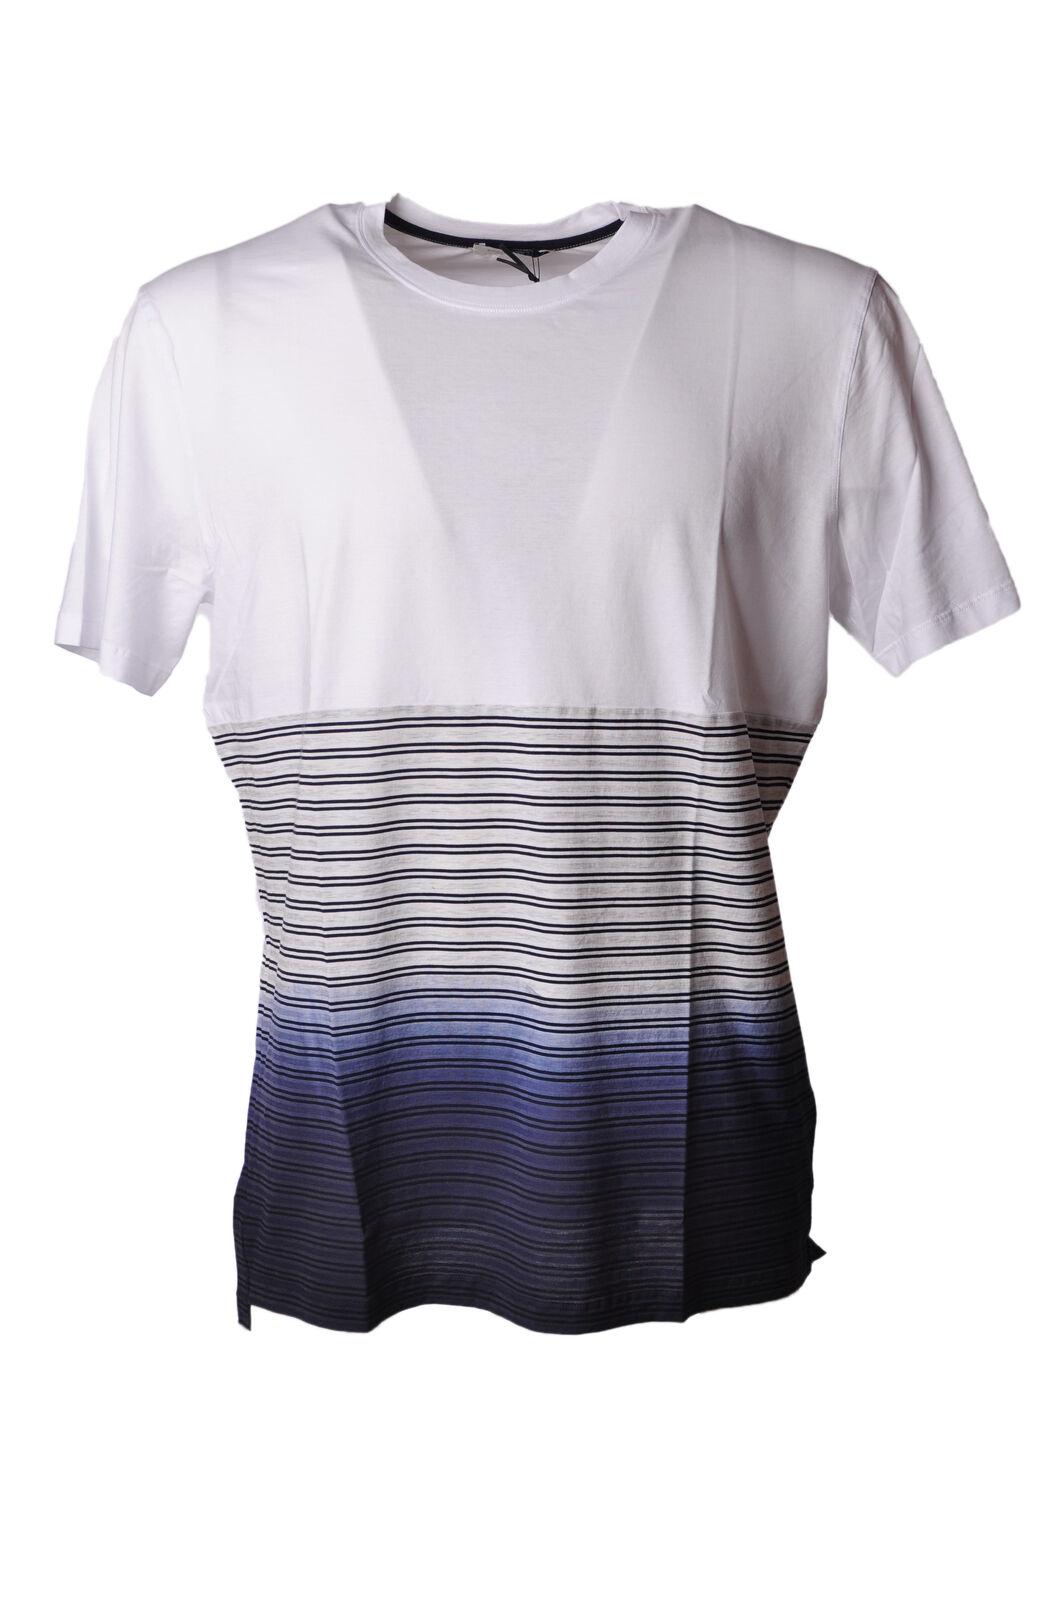 Paolo Pecora - Topwear-T-shirts - Mann - Weiß - 4718004E181522